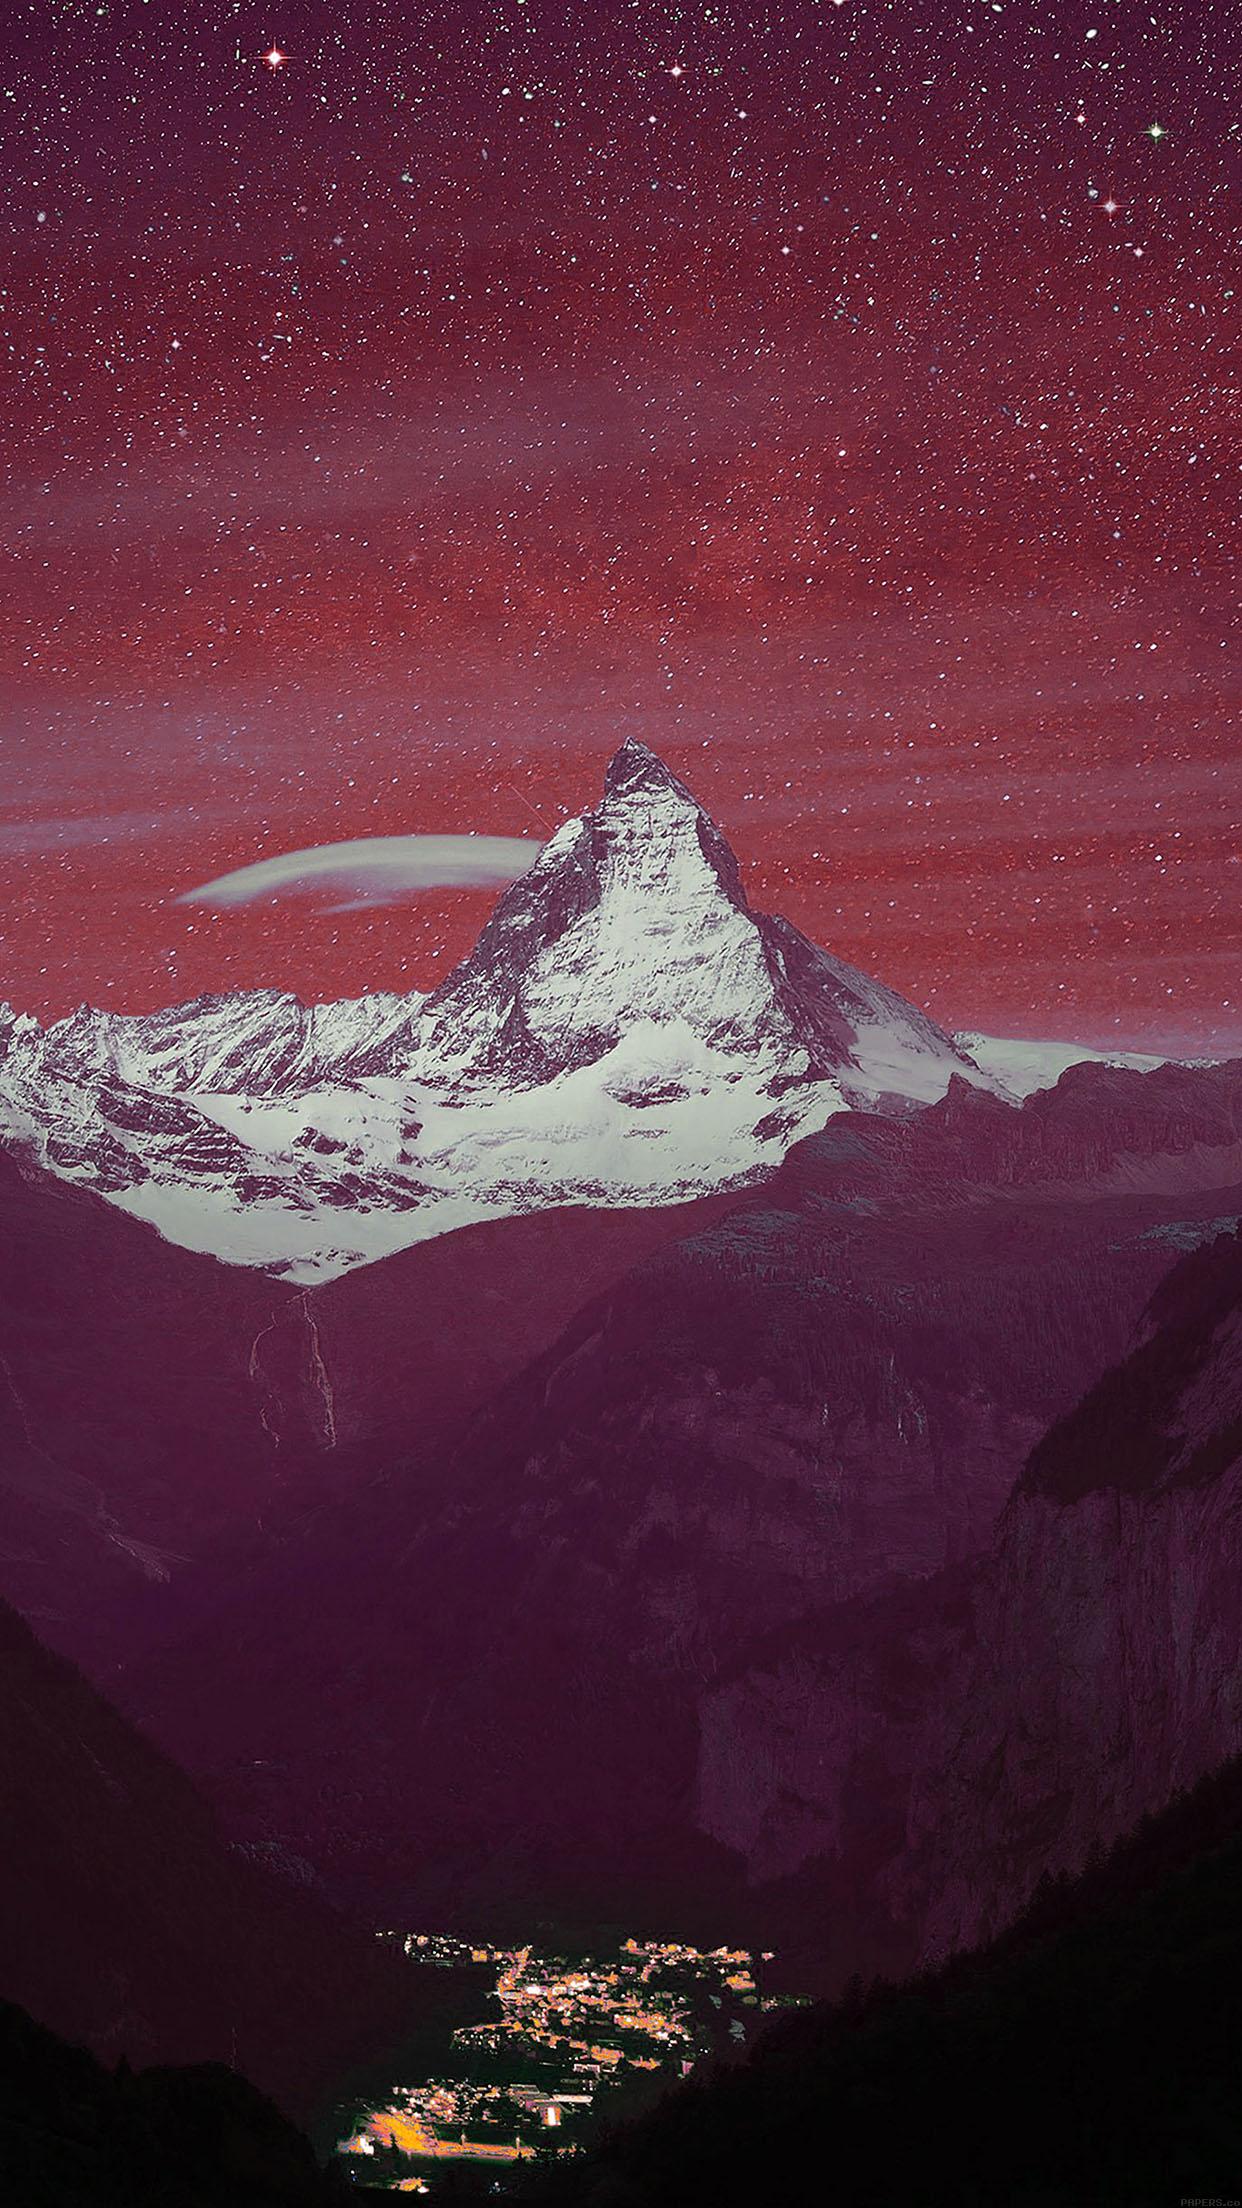 Winter Fall Mac Wallpaper Papers Co Iphone Wallpaper Ma52 Purple Night Mountain